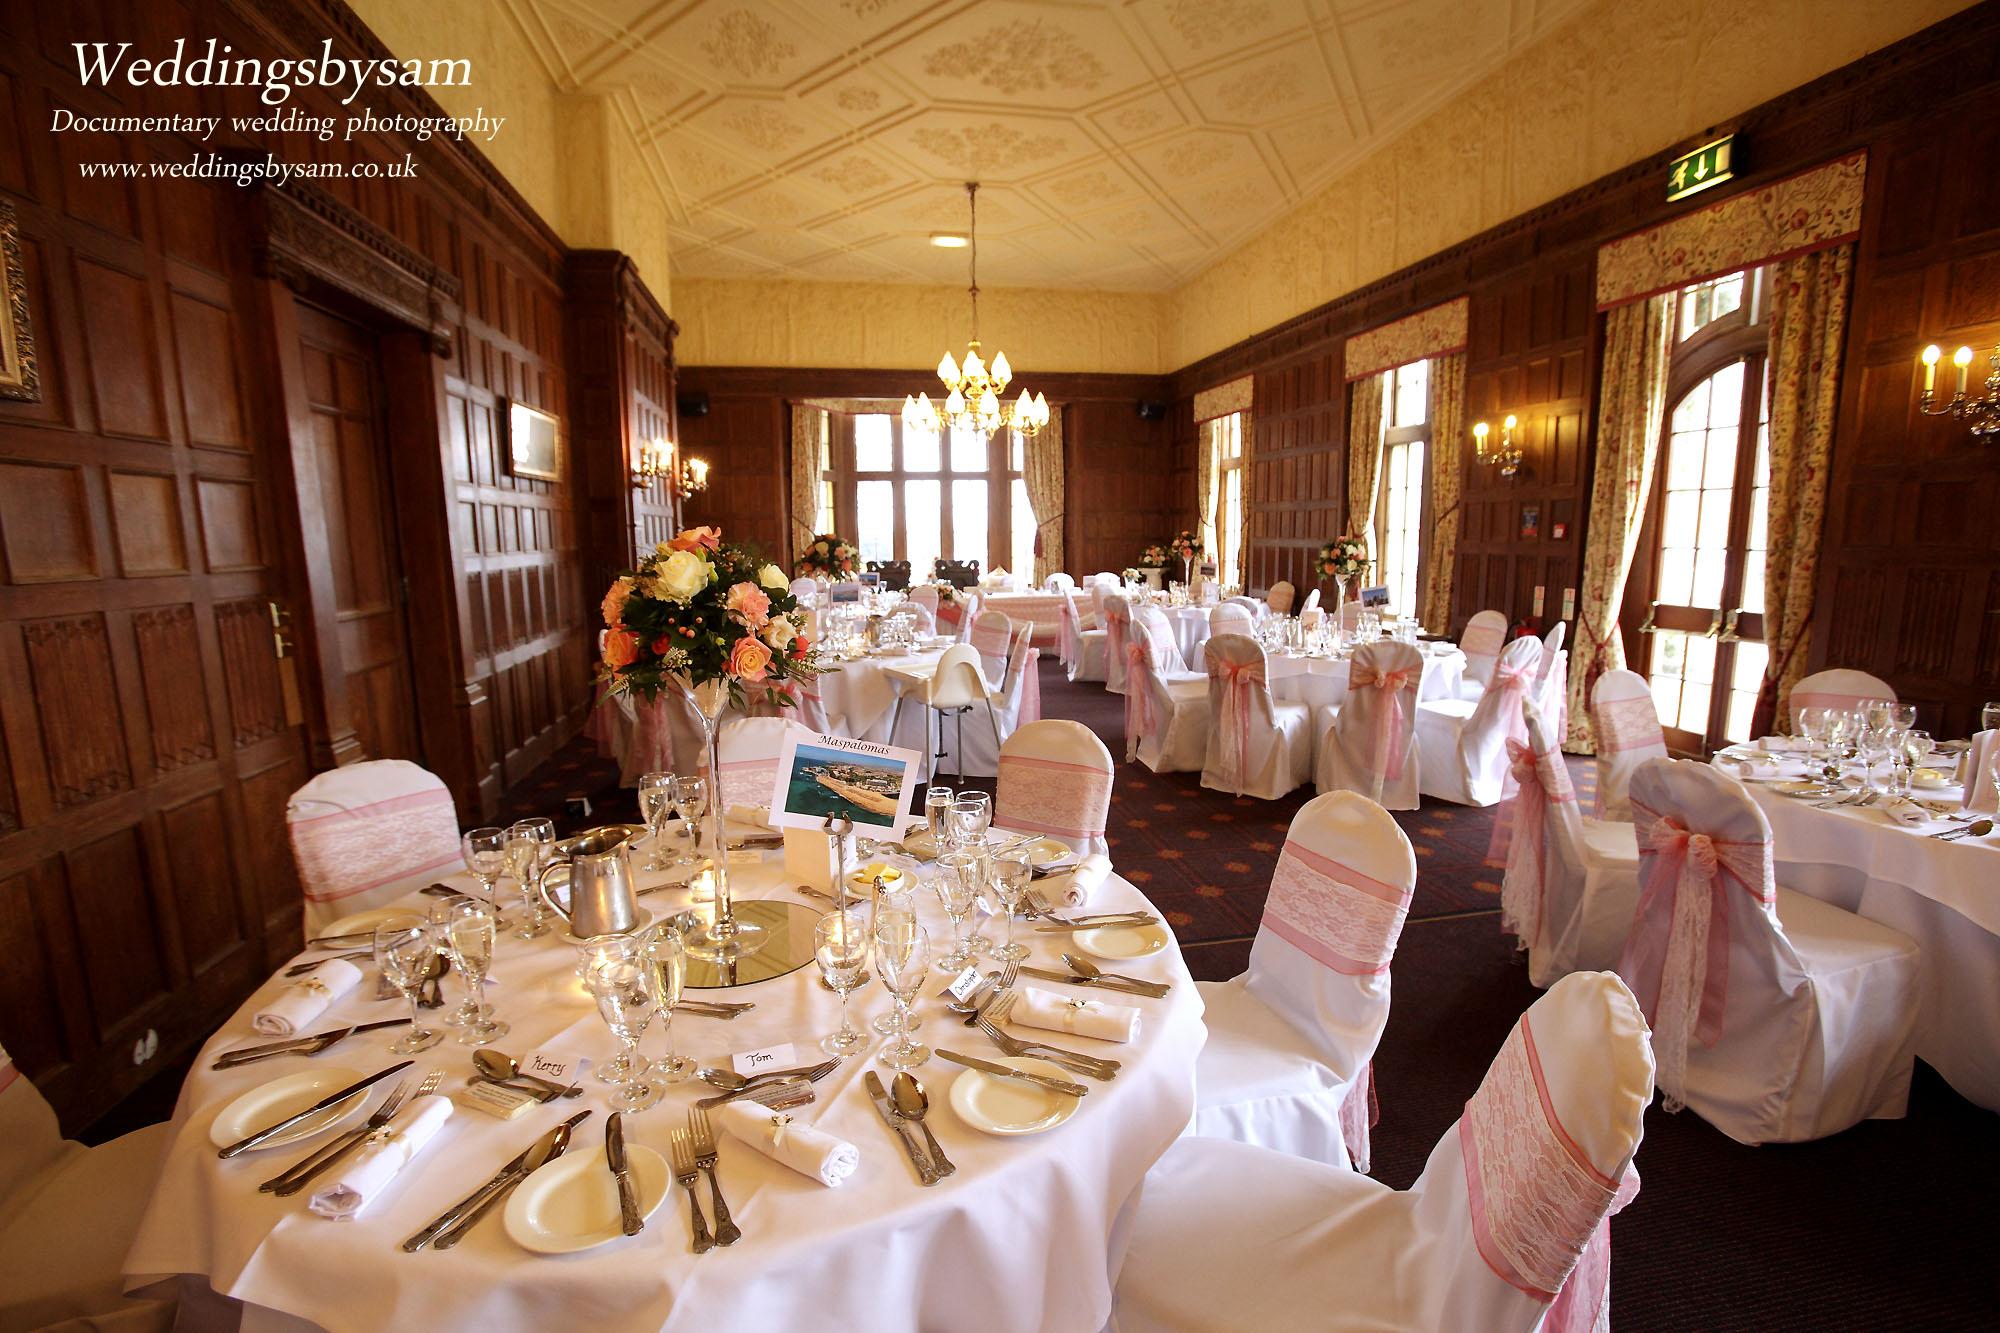 Wedding Breakfast Set Up – wedding photos of Dumbleton Hall Hotel ...